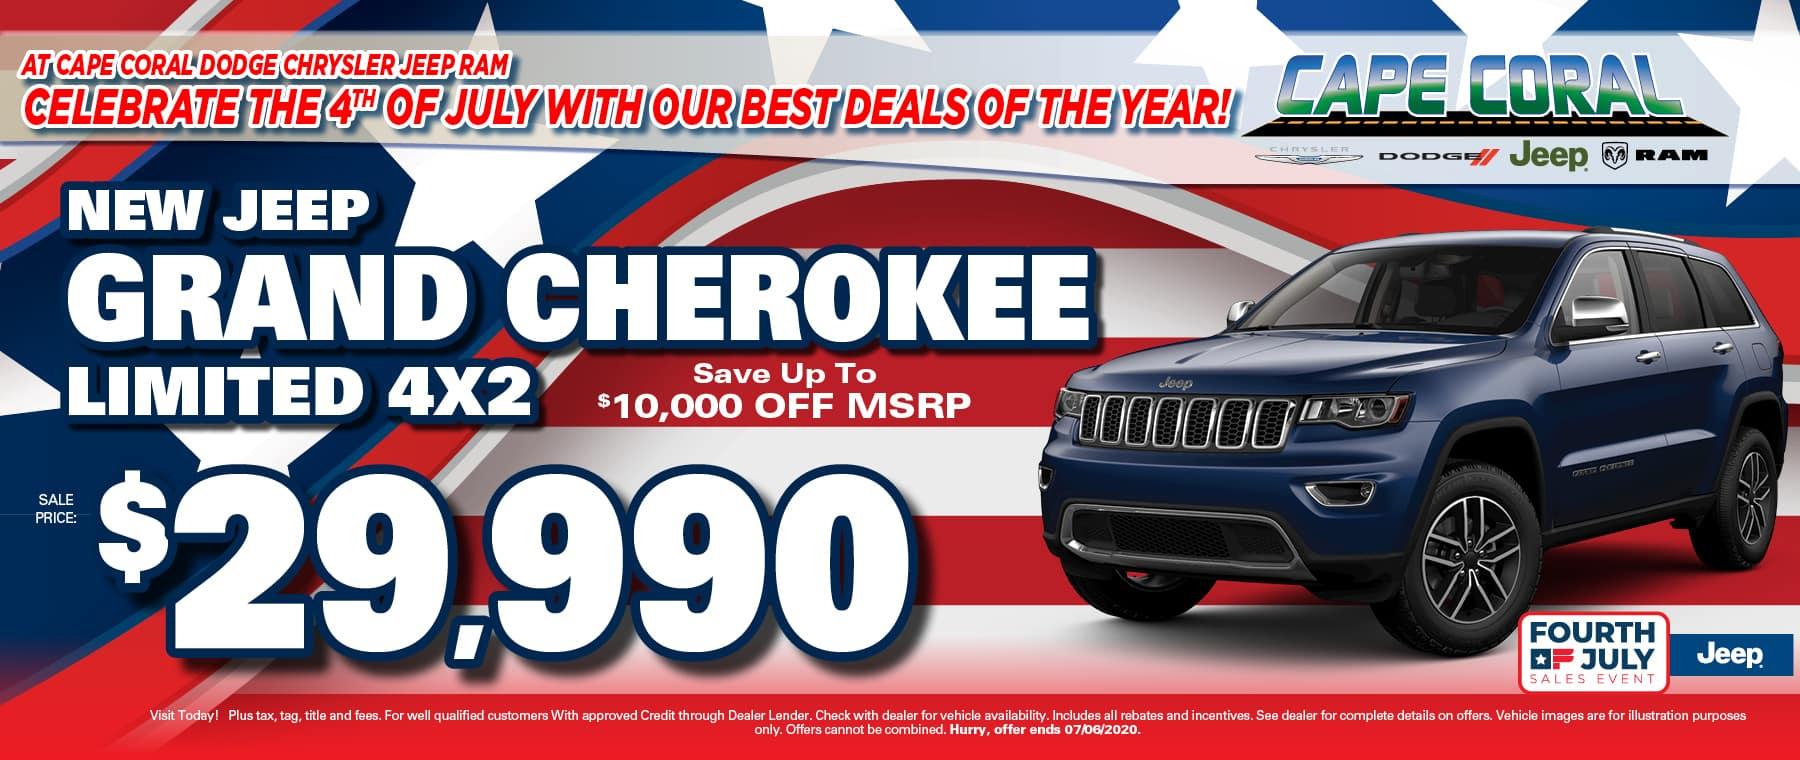 Grand Cherokee Soecial!